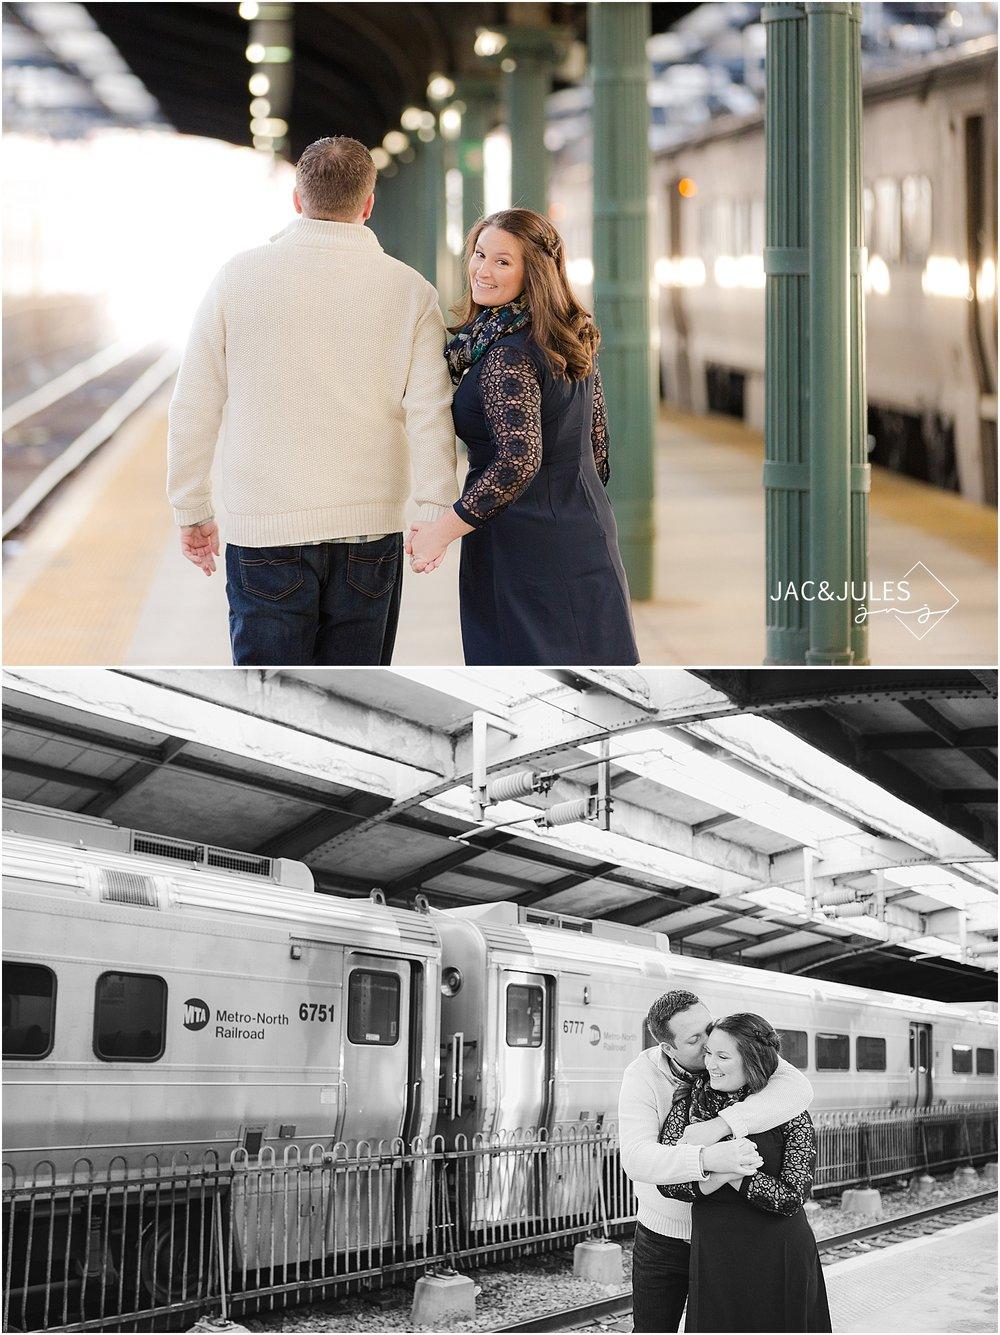 jacnjules photograph engagement photo at Hoboken train station in NJ